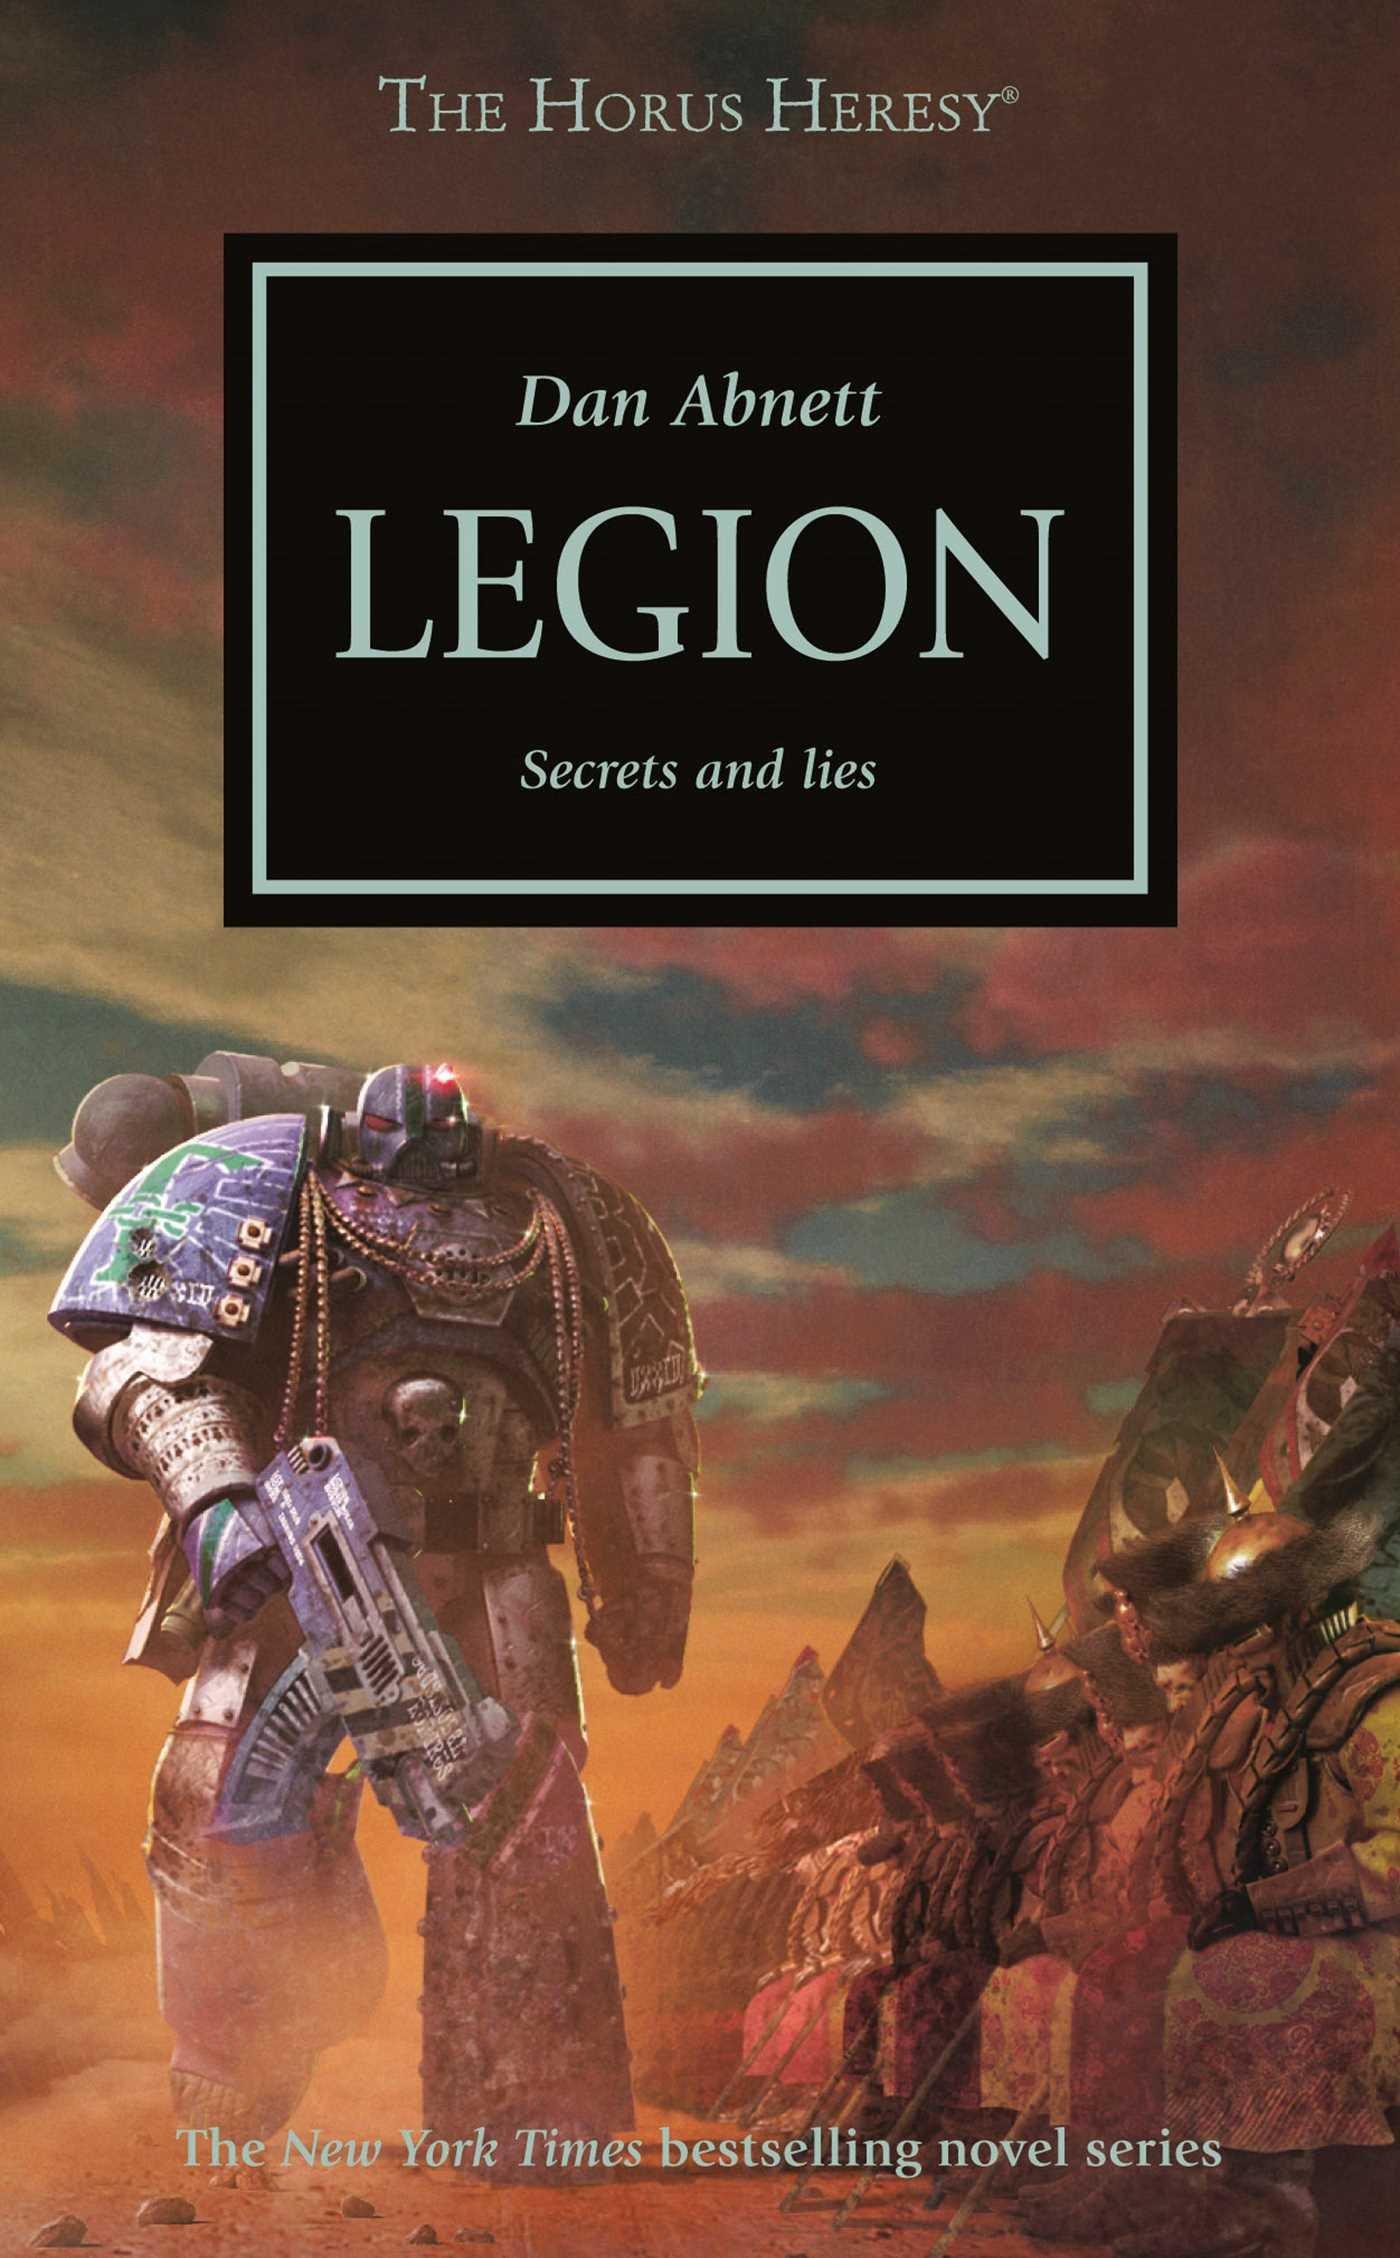 Amazon: Legion (the Horus Heresy) (9781849708159): Dan Abnett: Books